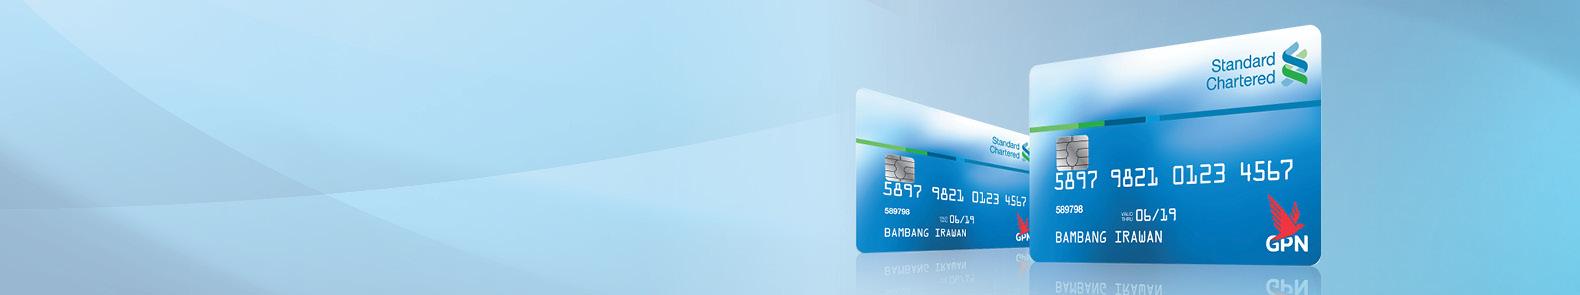 standard chartered npg debit card